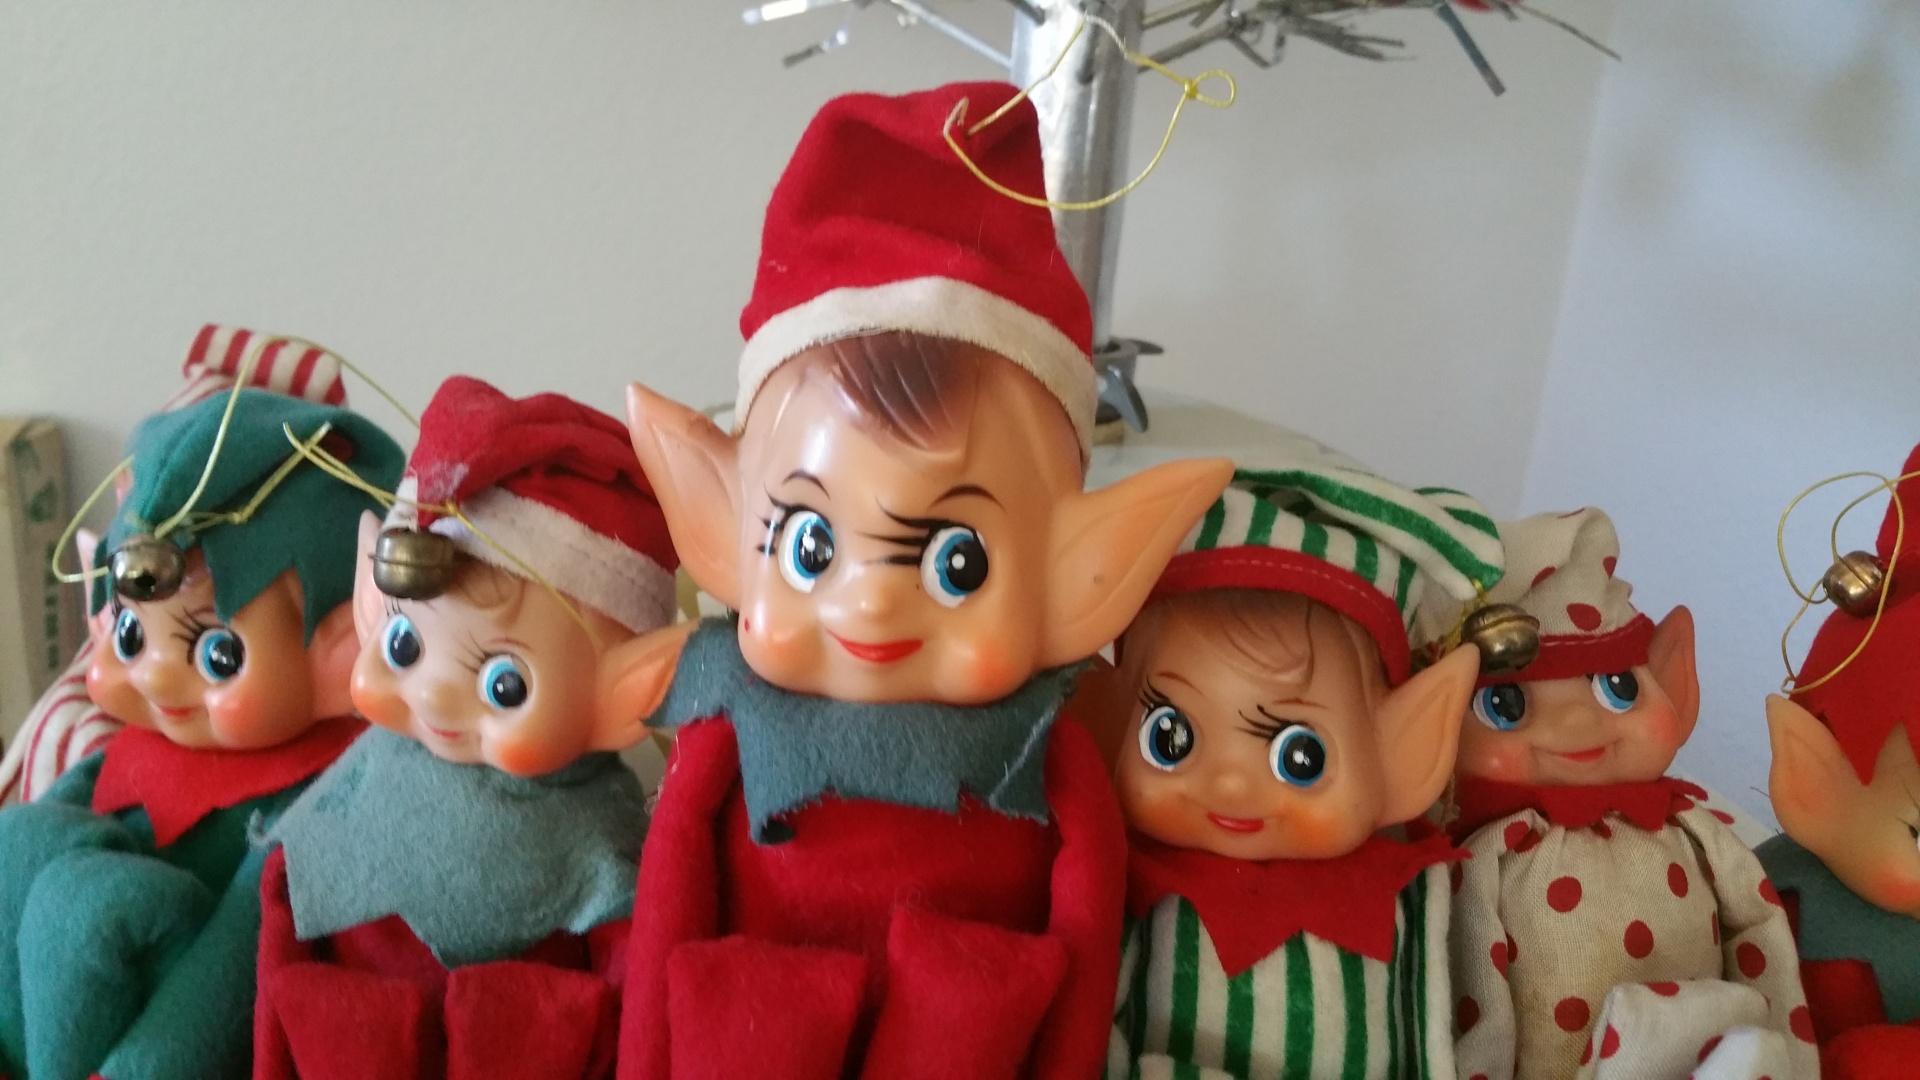 Elf Dolls Free Stock Photo Public Domain Pictures